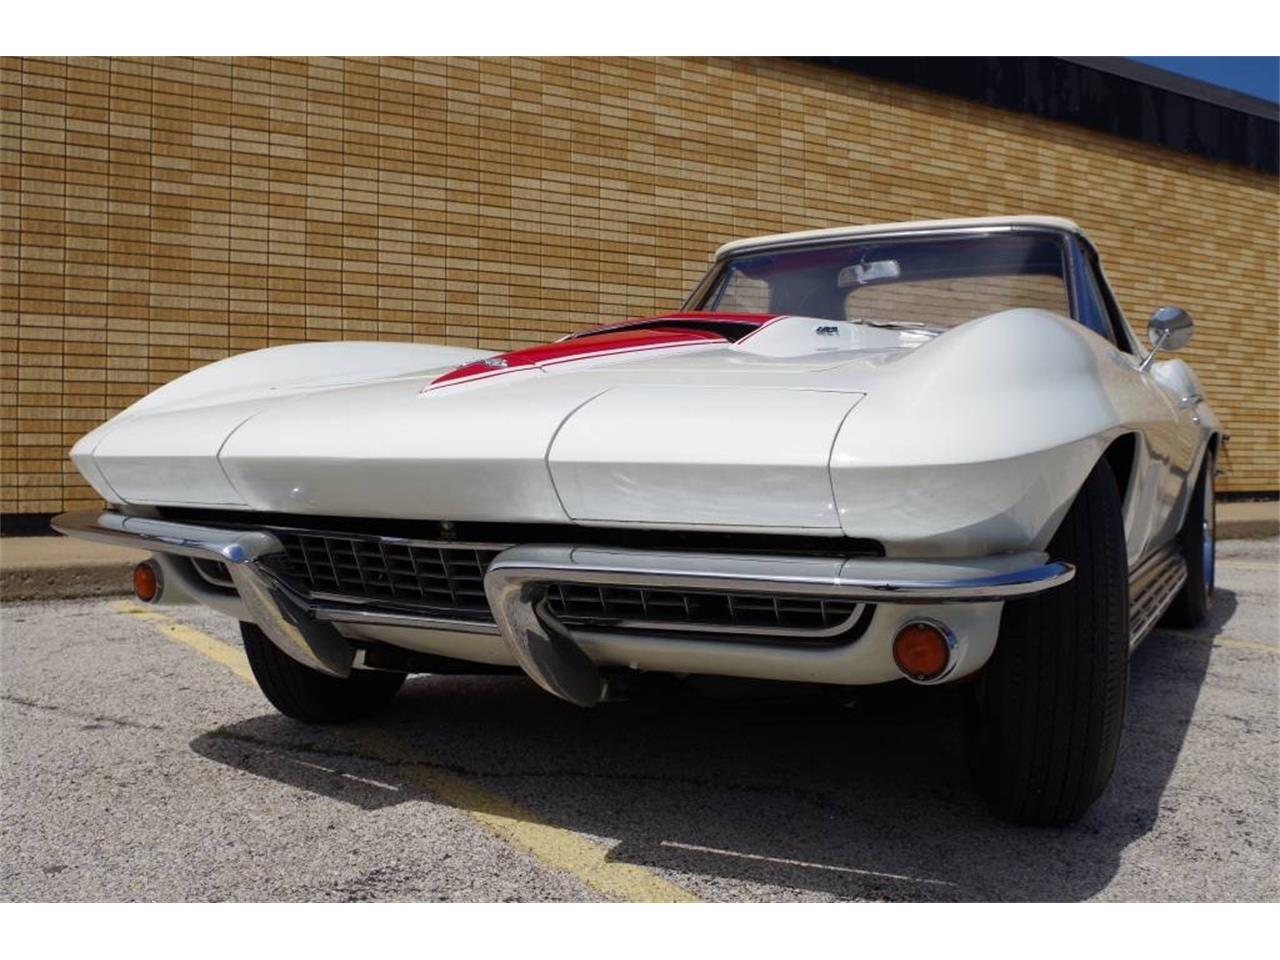 Large Picture of Classic 1967 Corvette located in N. Kansas City Missouri - $129,995.00 - MO1U